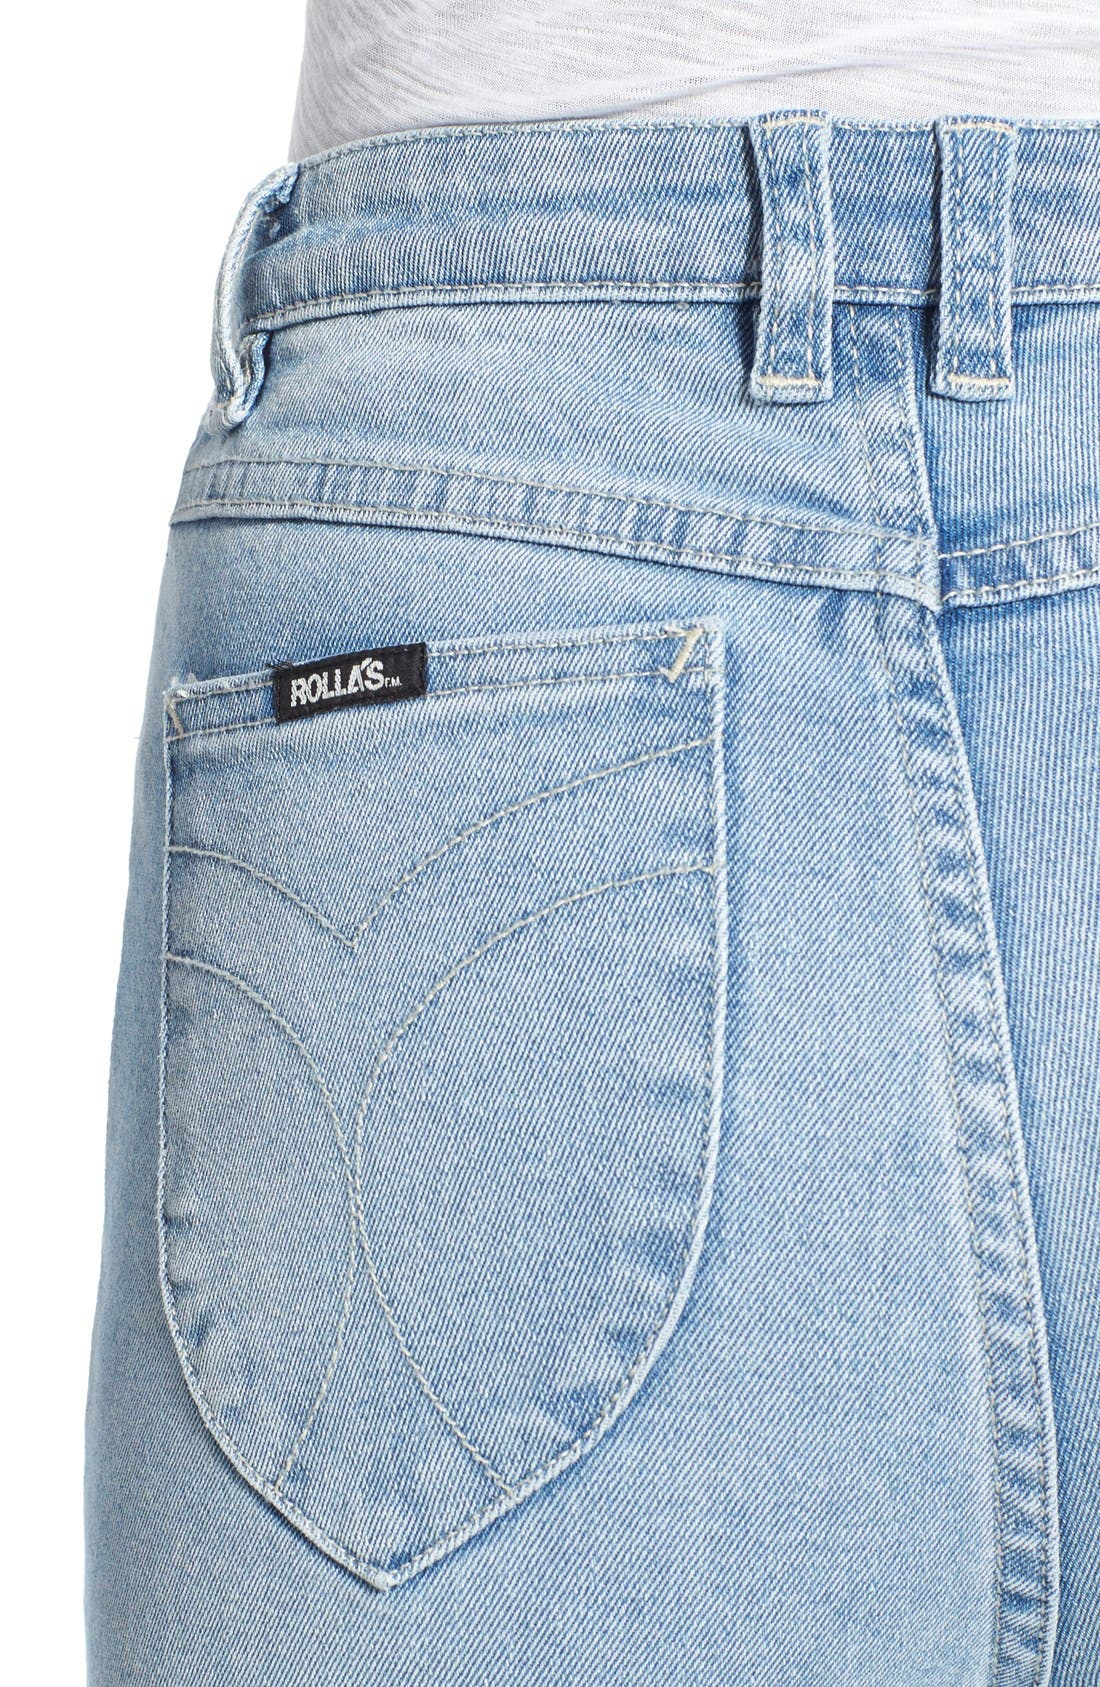 ROLLA'S,                             'East Coast' Flare Jeans,                             Alternate thumbnail 4, color,                             430